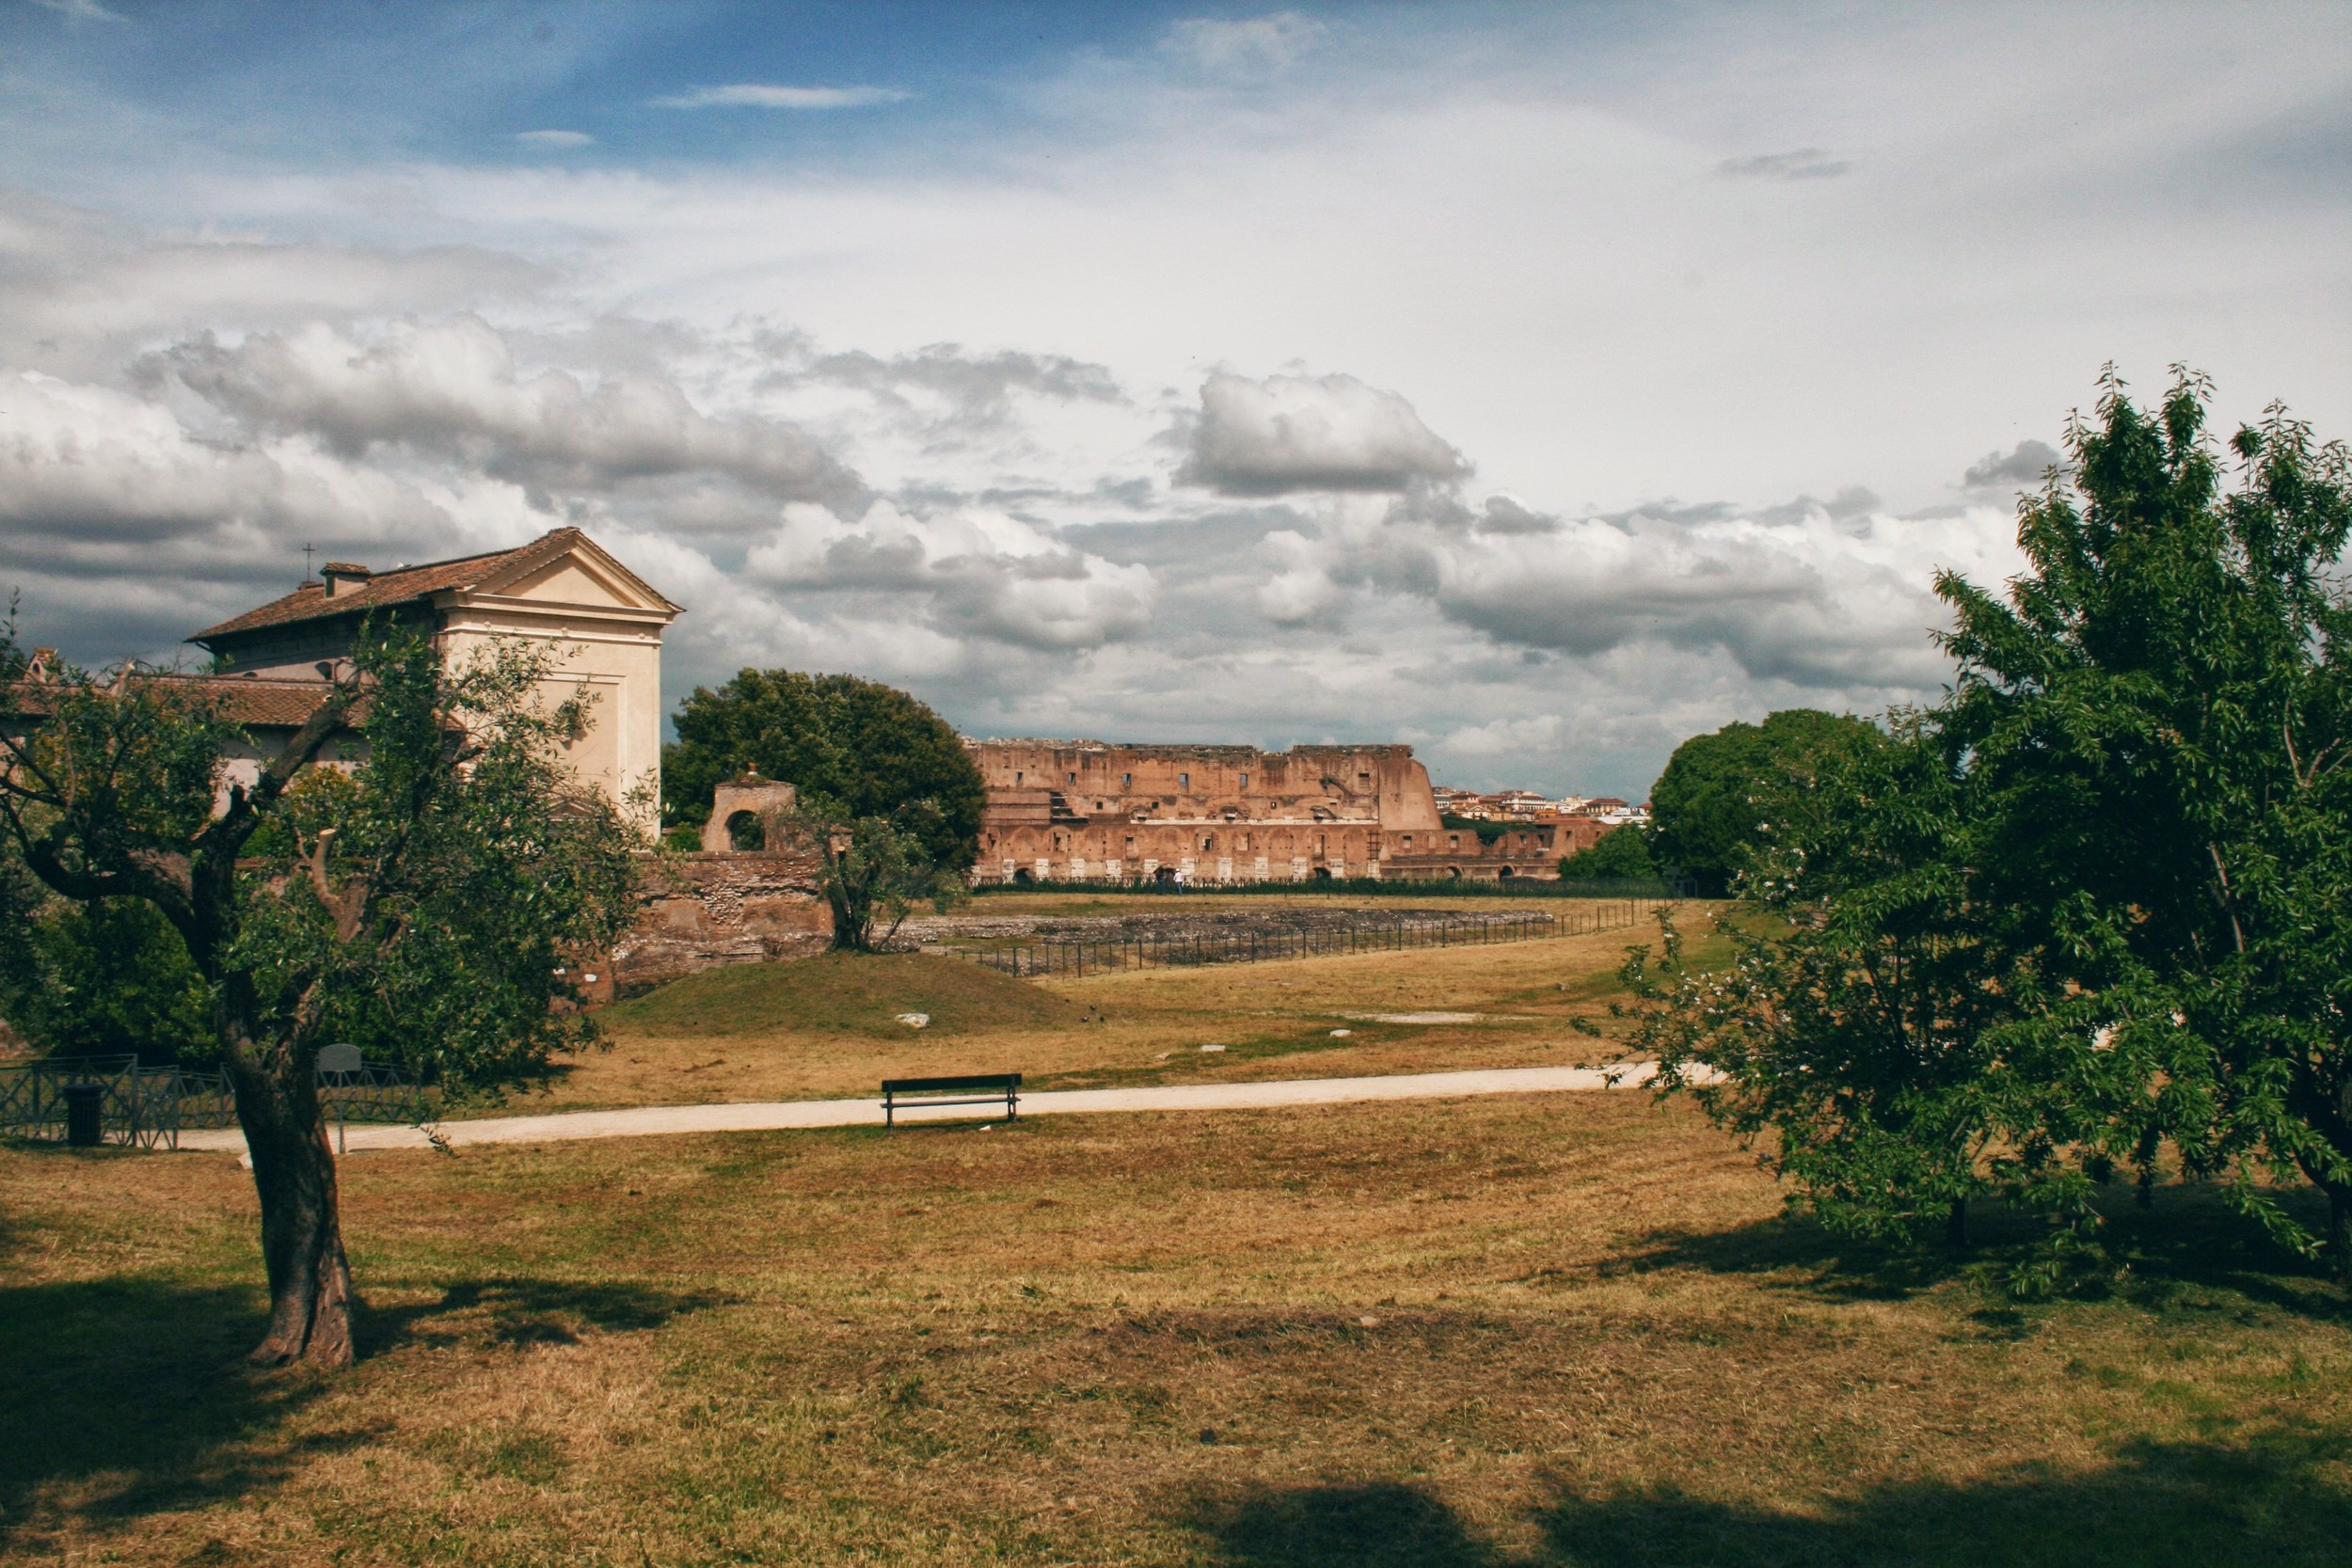 The Weekly Getaway: Rome bursting in color